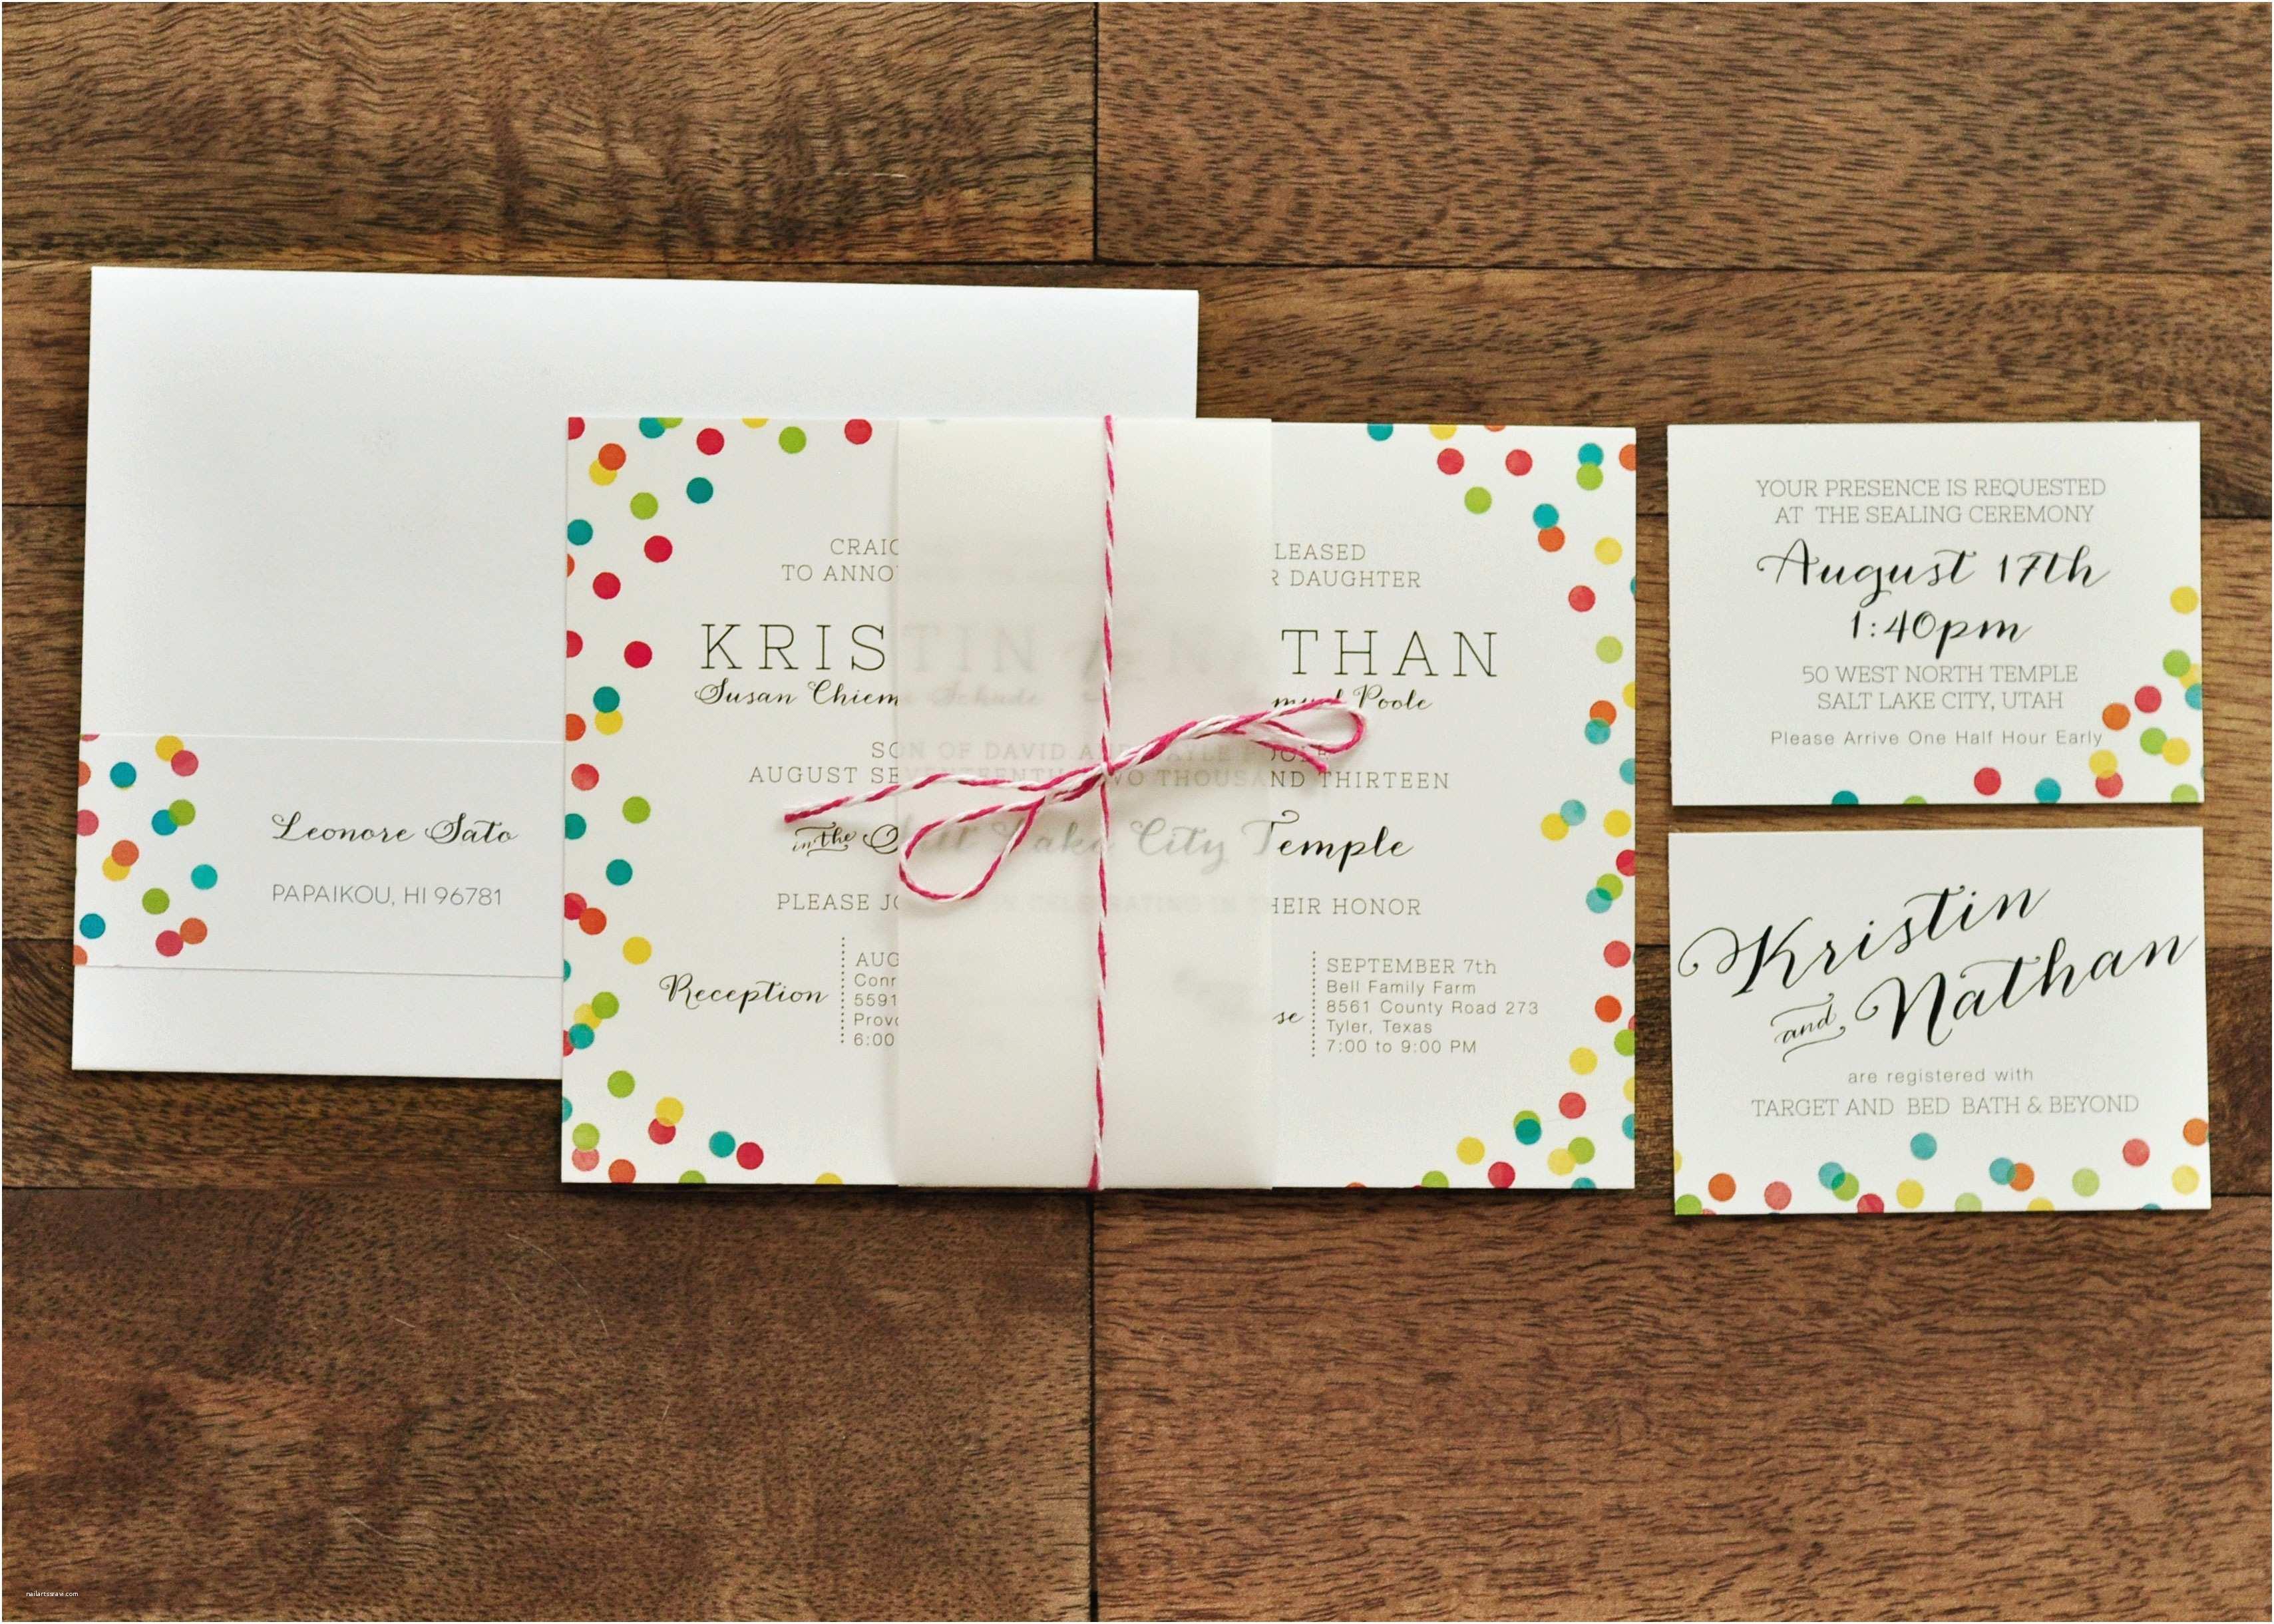 Wedding Invitations Utah Engrossing Wedding Invitations Utah County Invitations